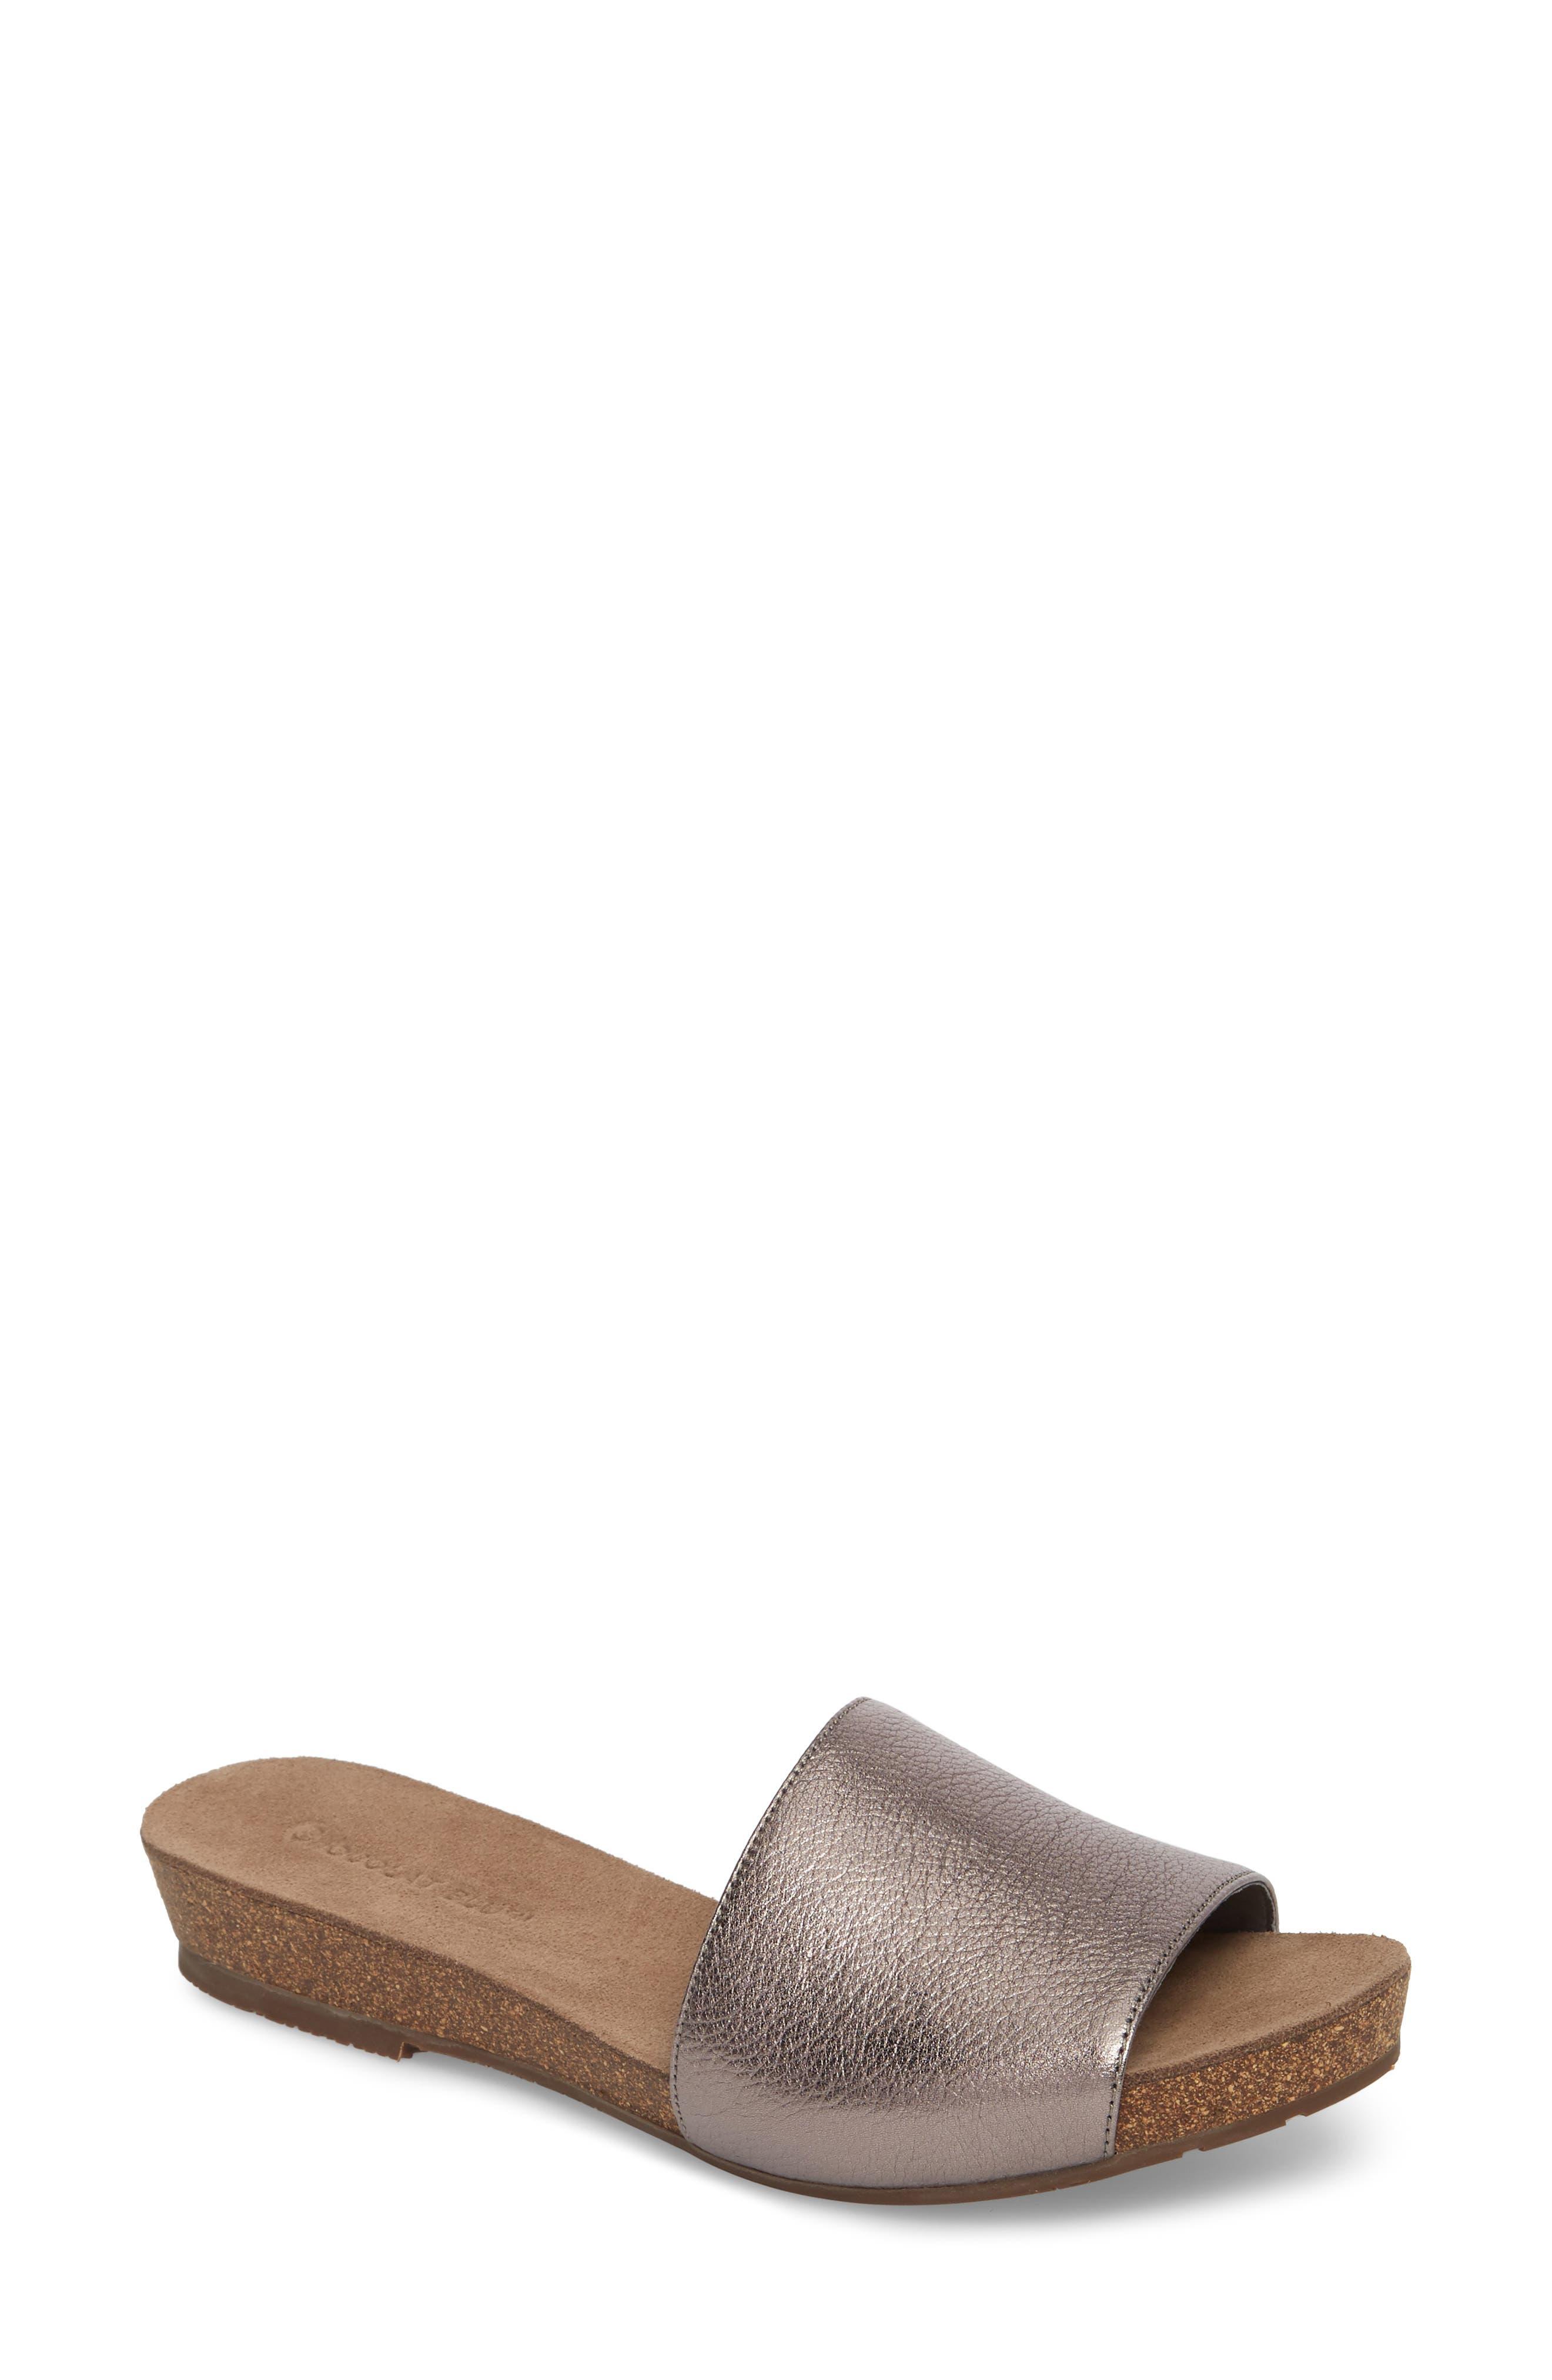 Viveca Slide Sandal,                         Main,                         color, 061